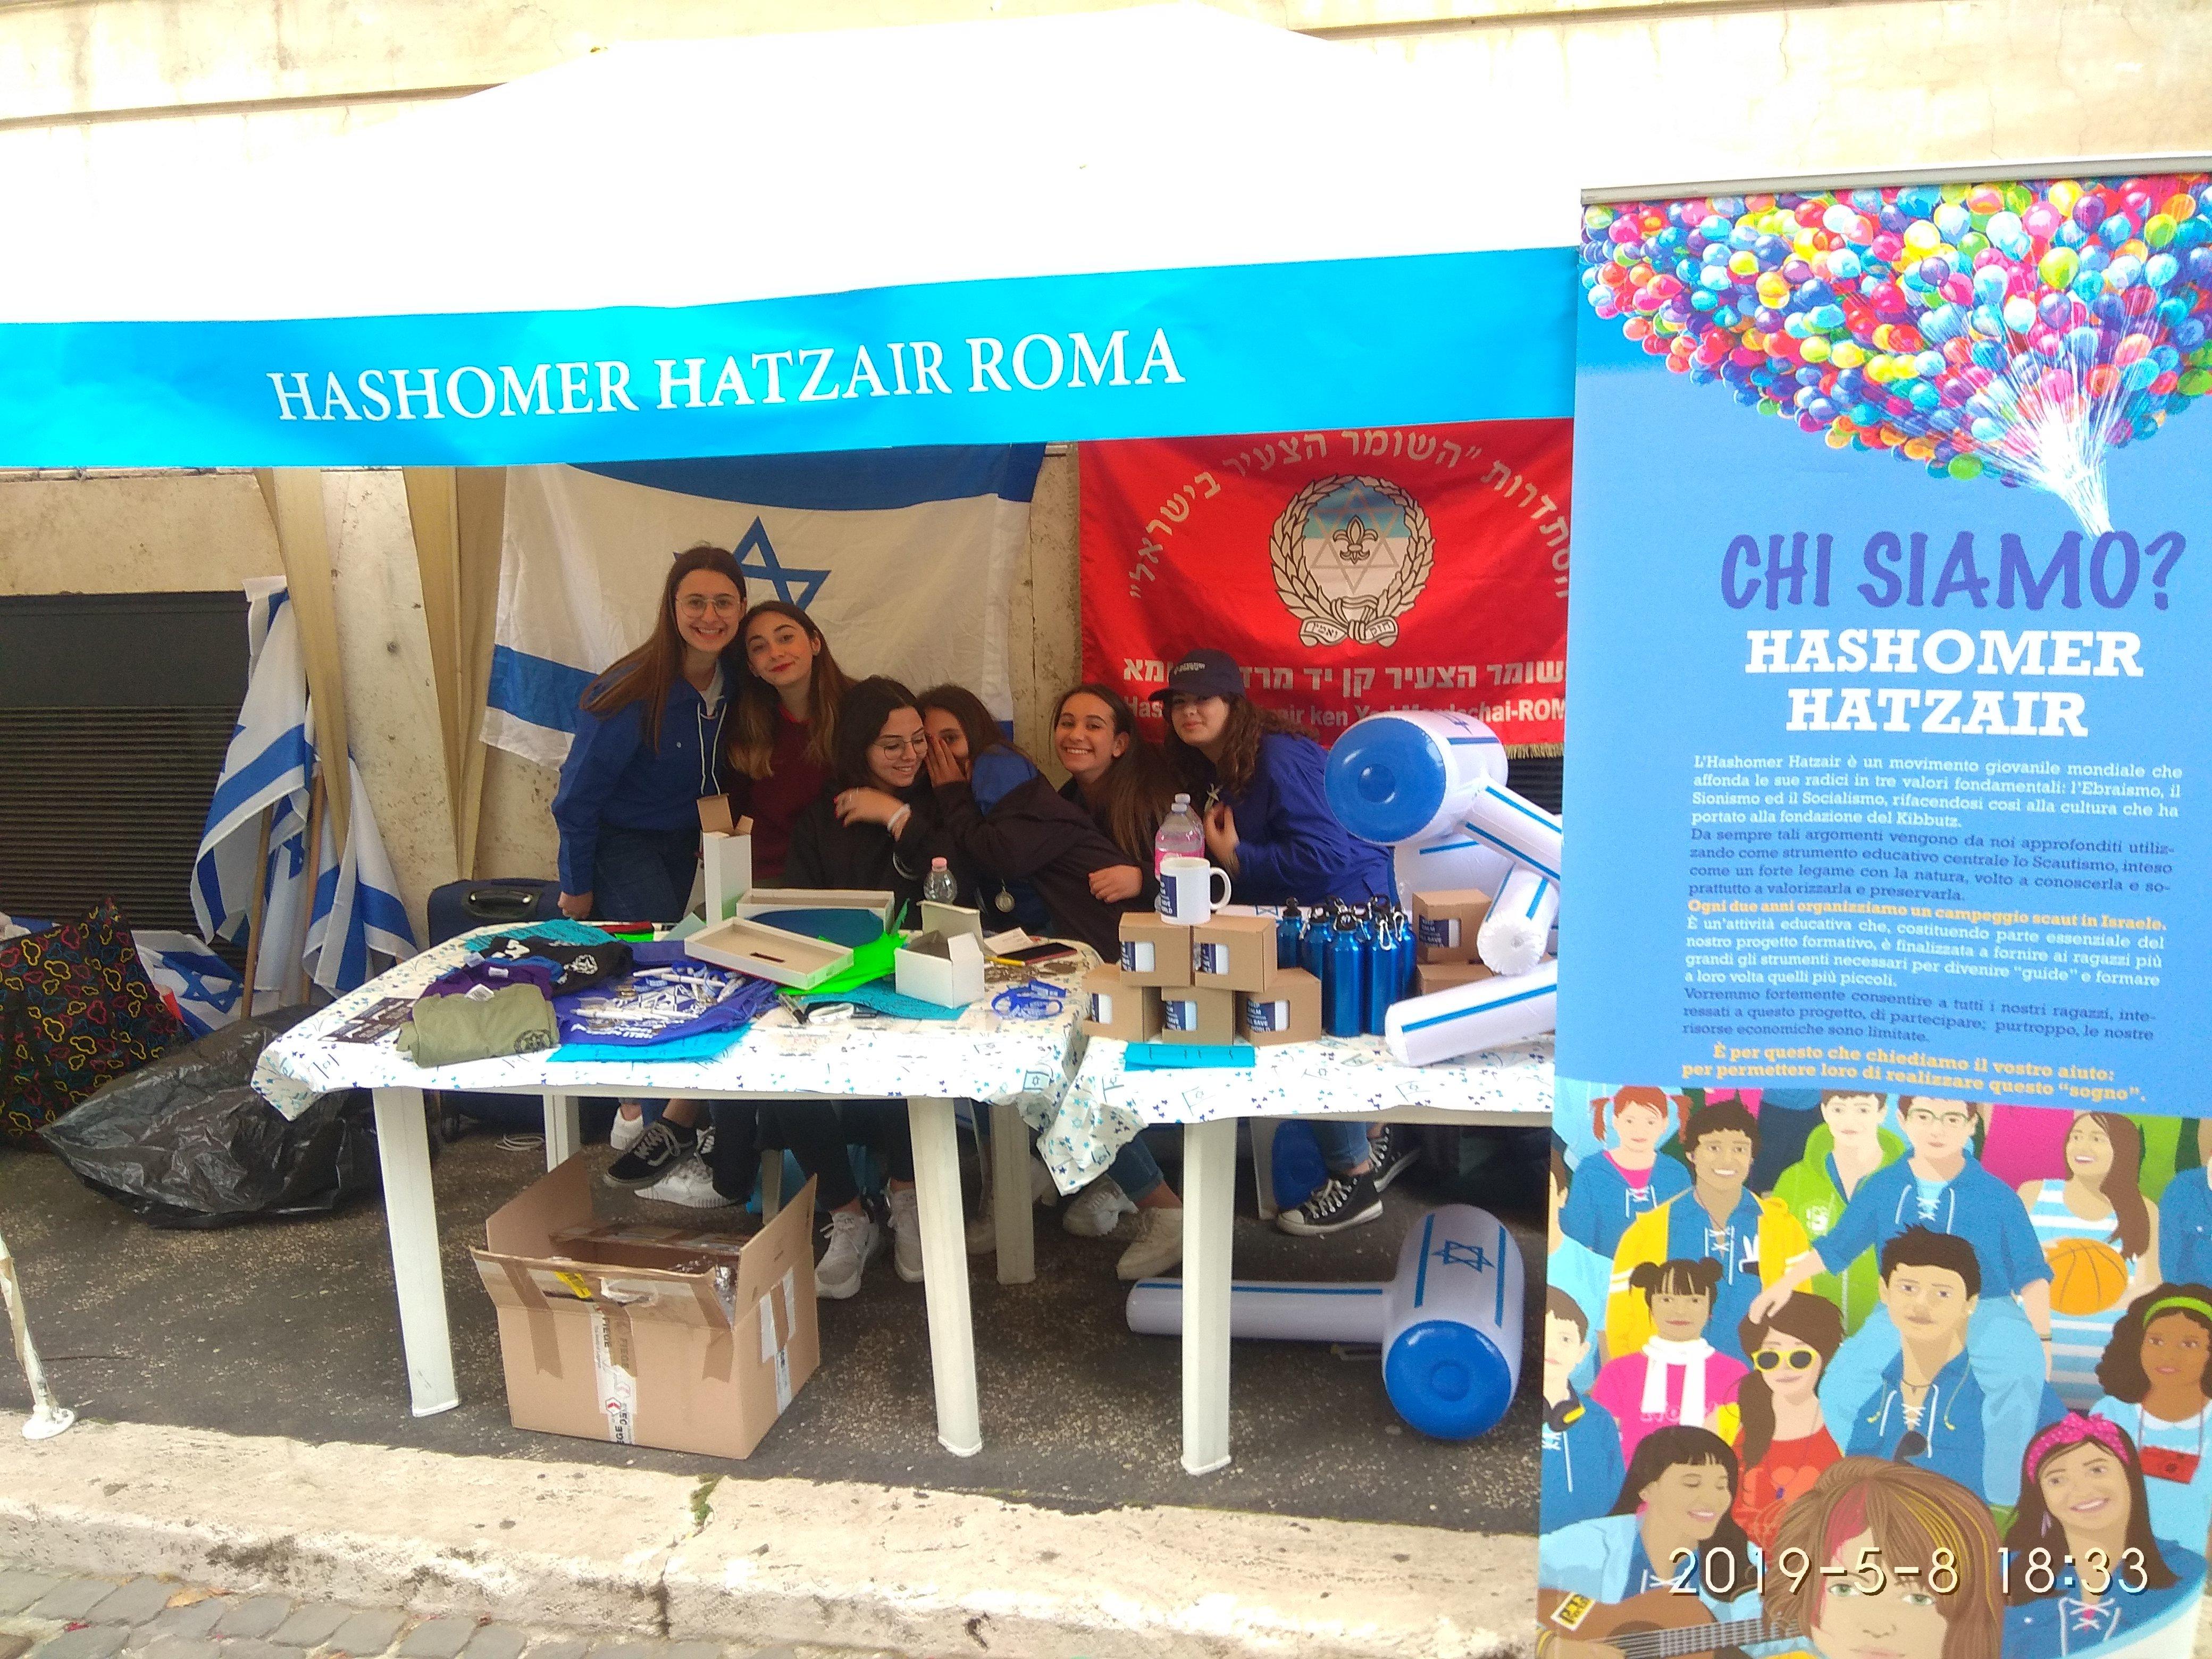 Hashomer Hatzair Roma